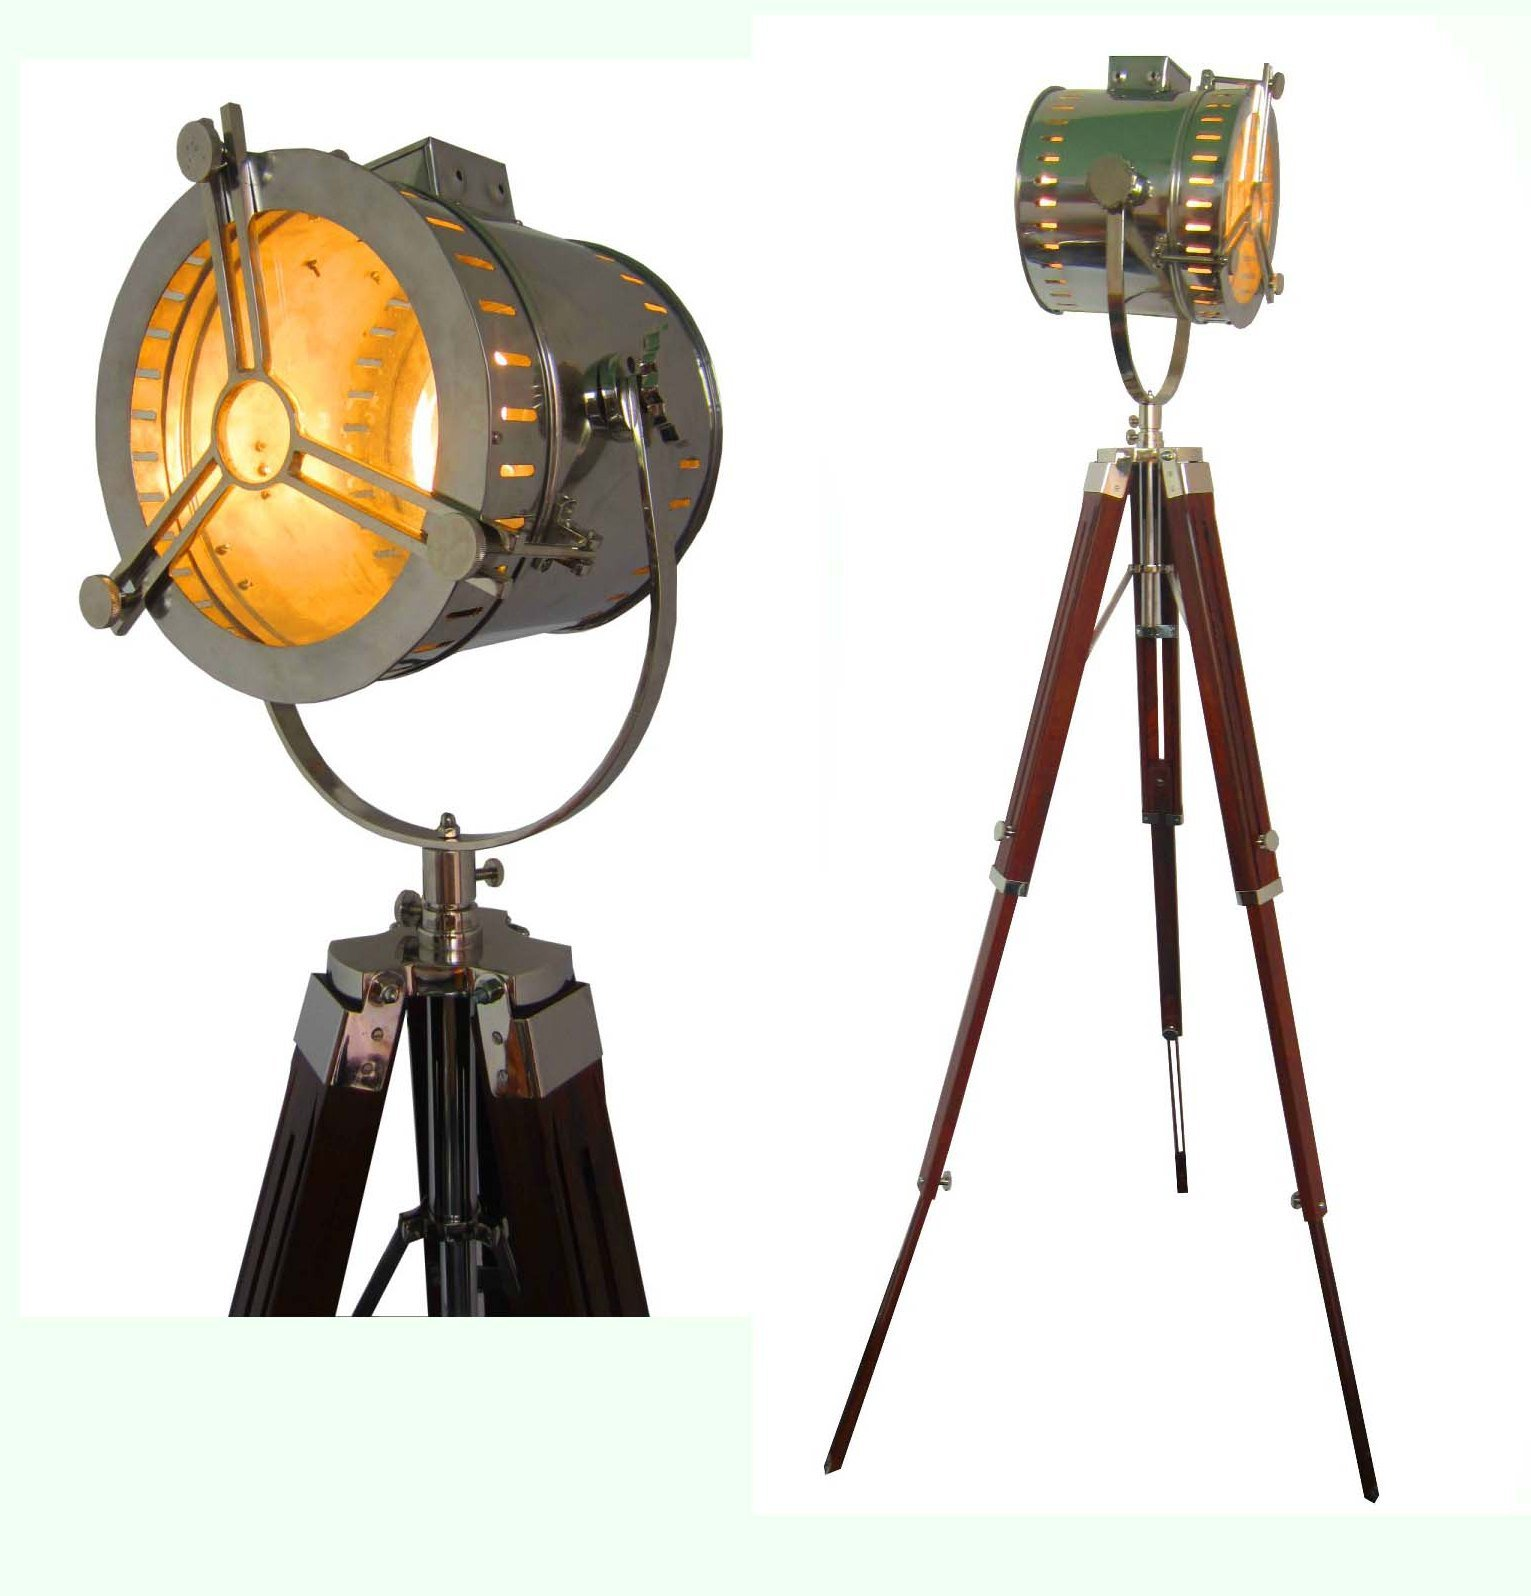 TieetDye Floor Lamp Home Decorative Vintage Design Tripod Lighting Searchlight Spot Light